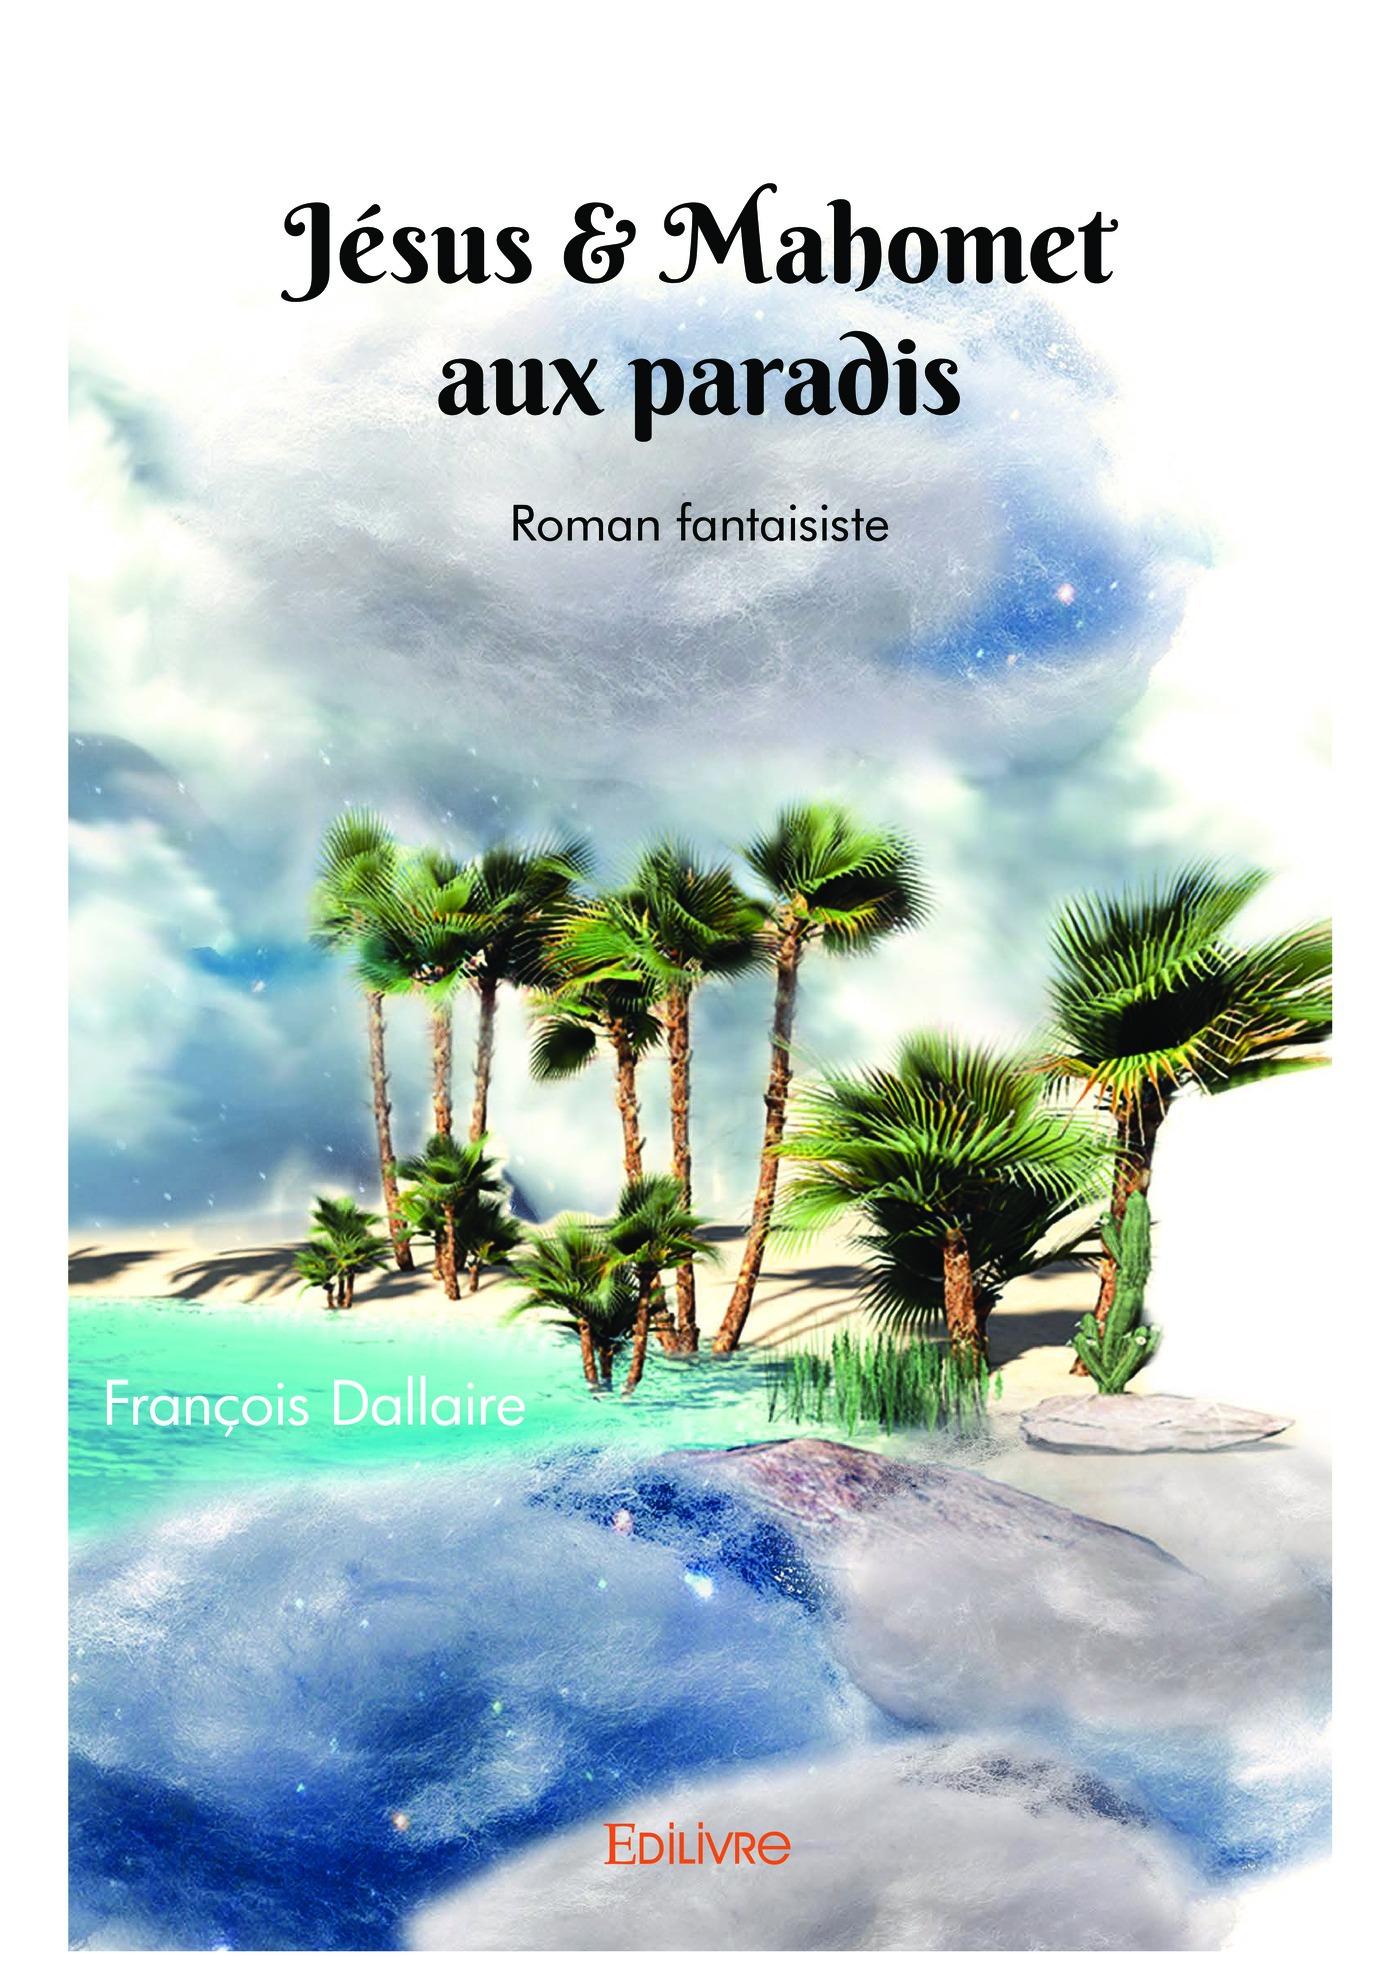 Jesus & mahomet aux paradis